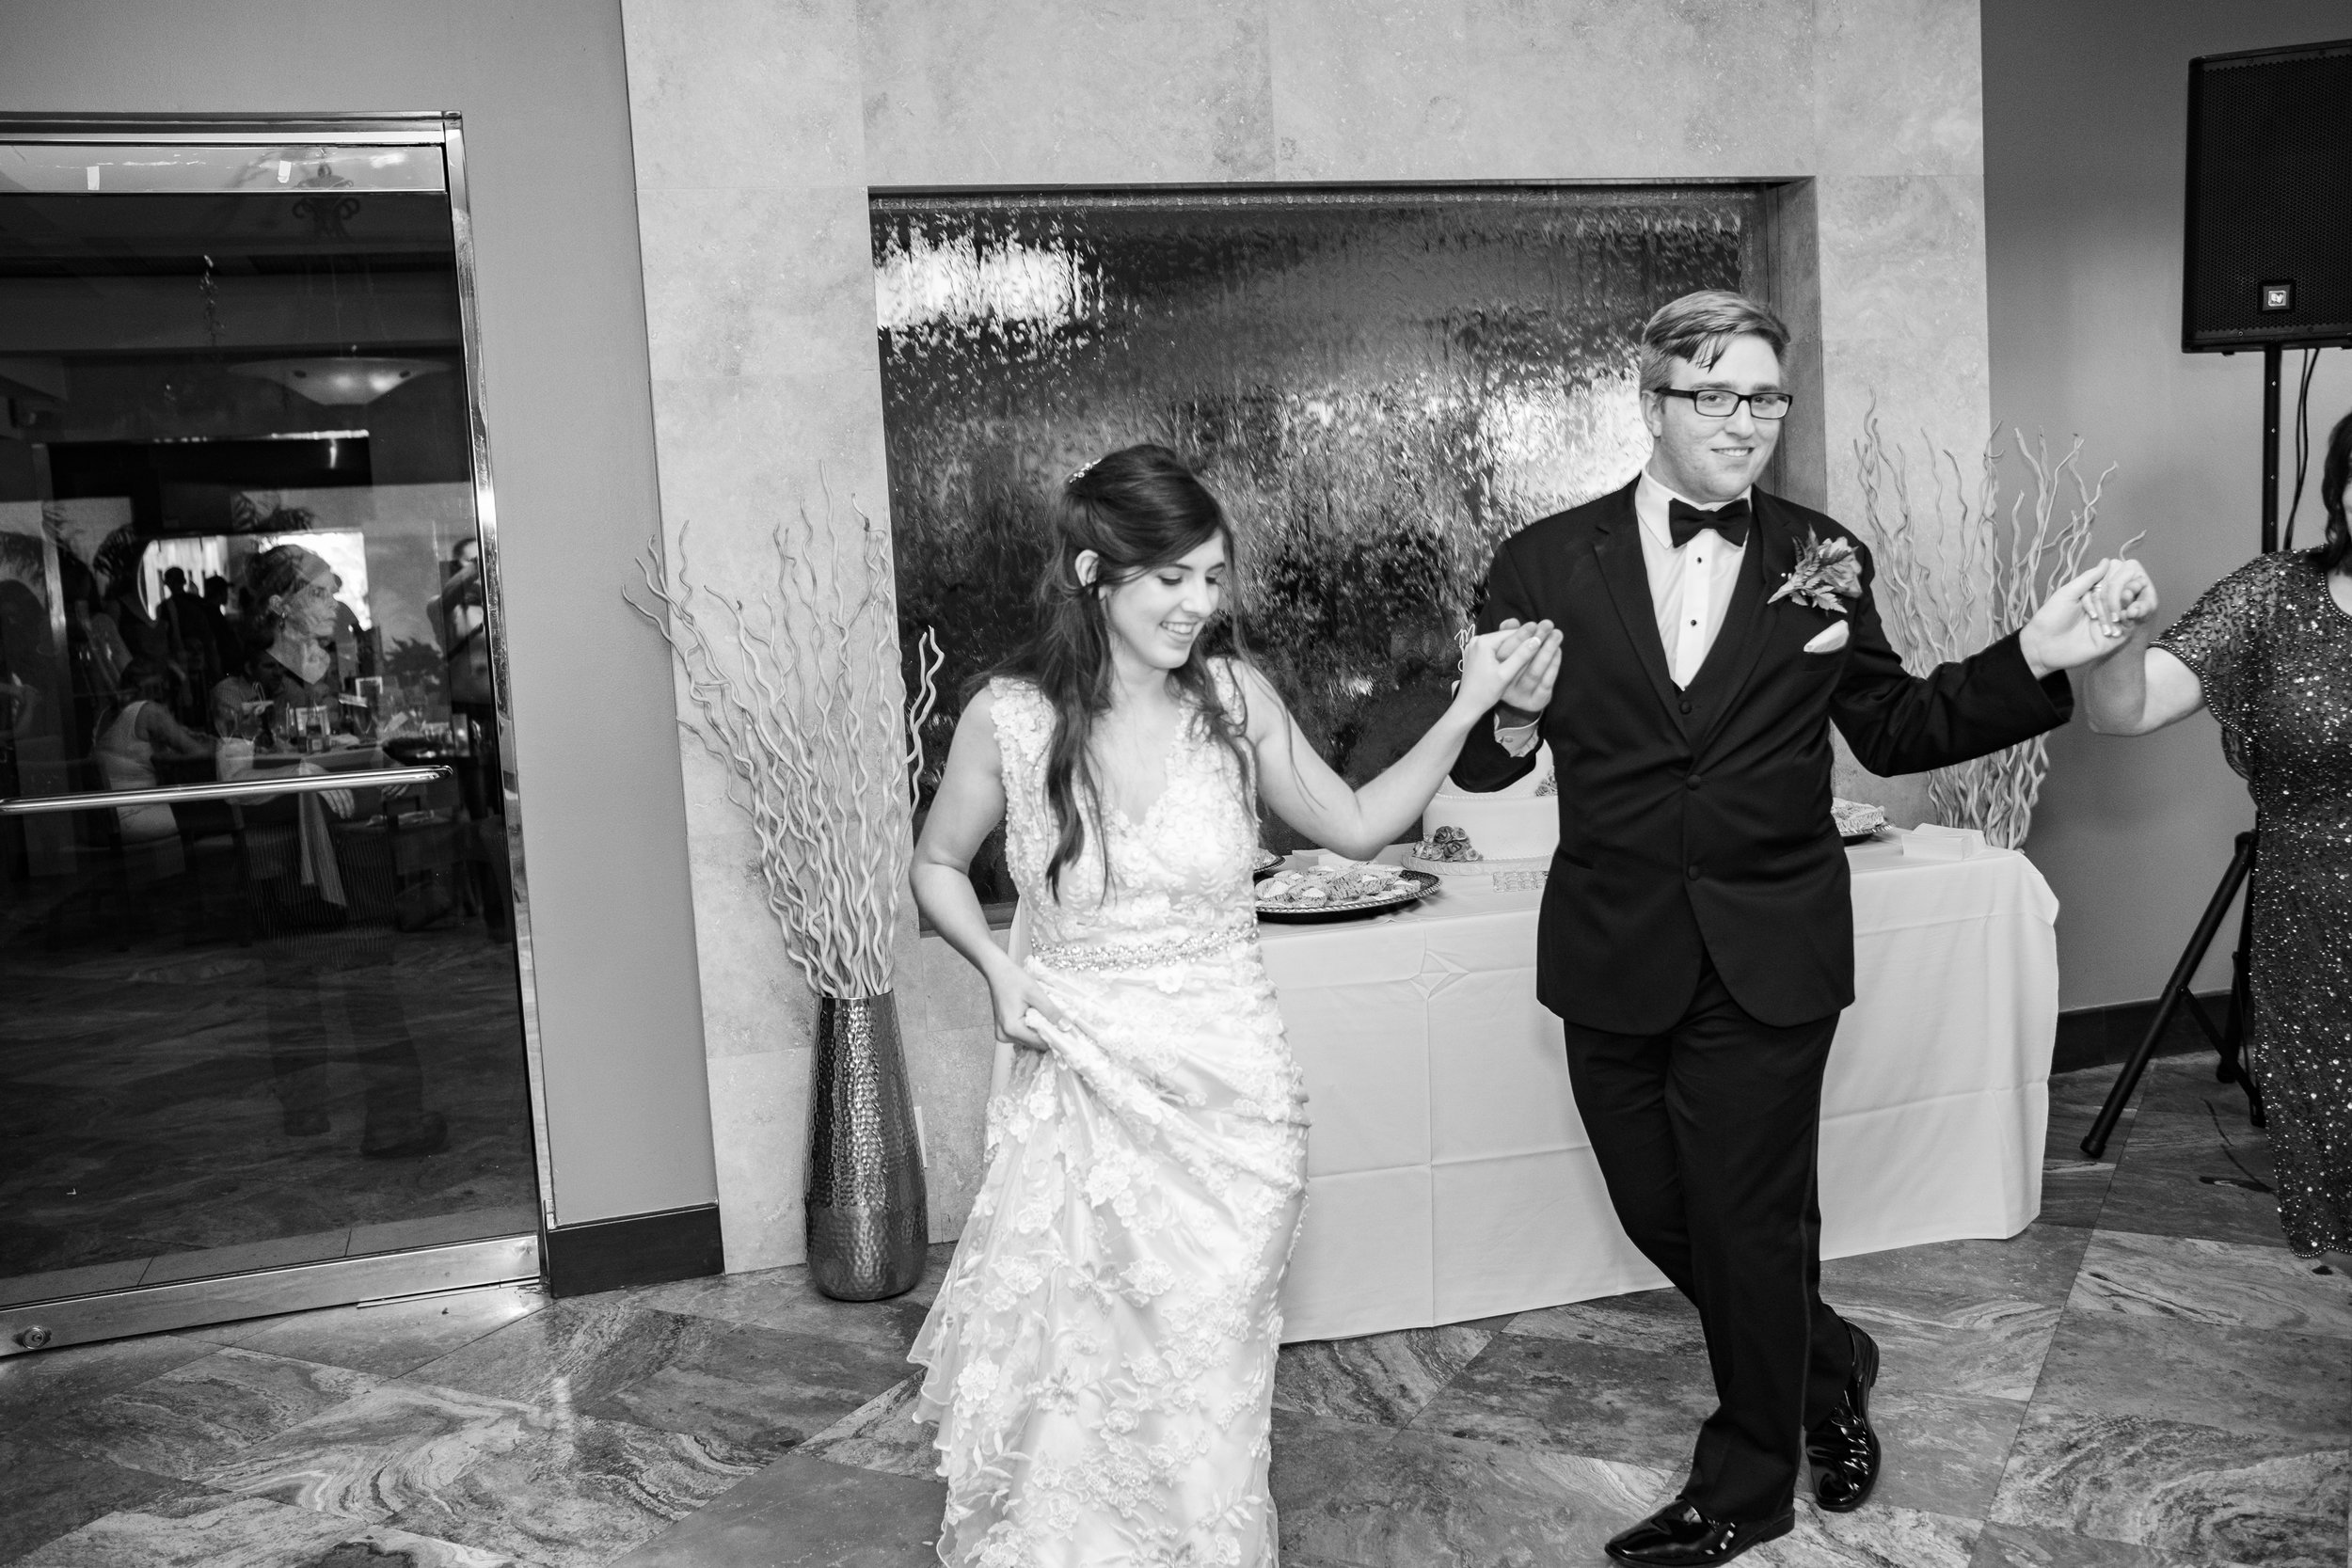 HAH_Zoe and Daniel_Clearwater Wedding_524_2018.jpg